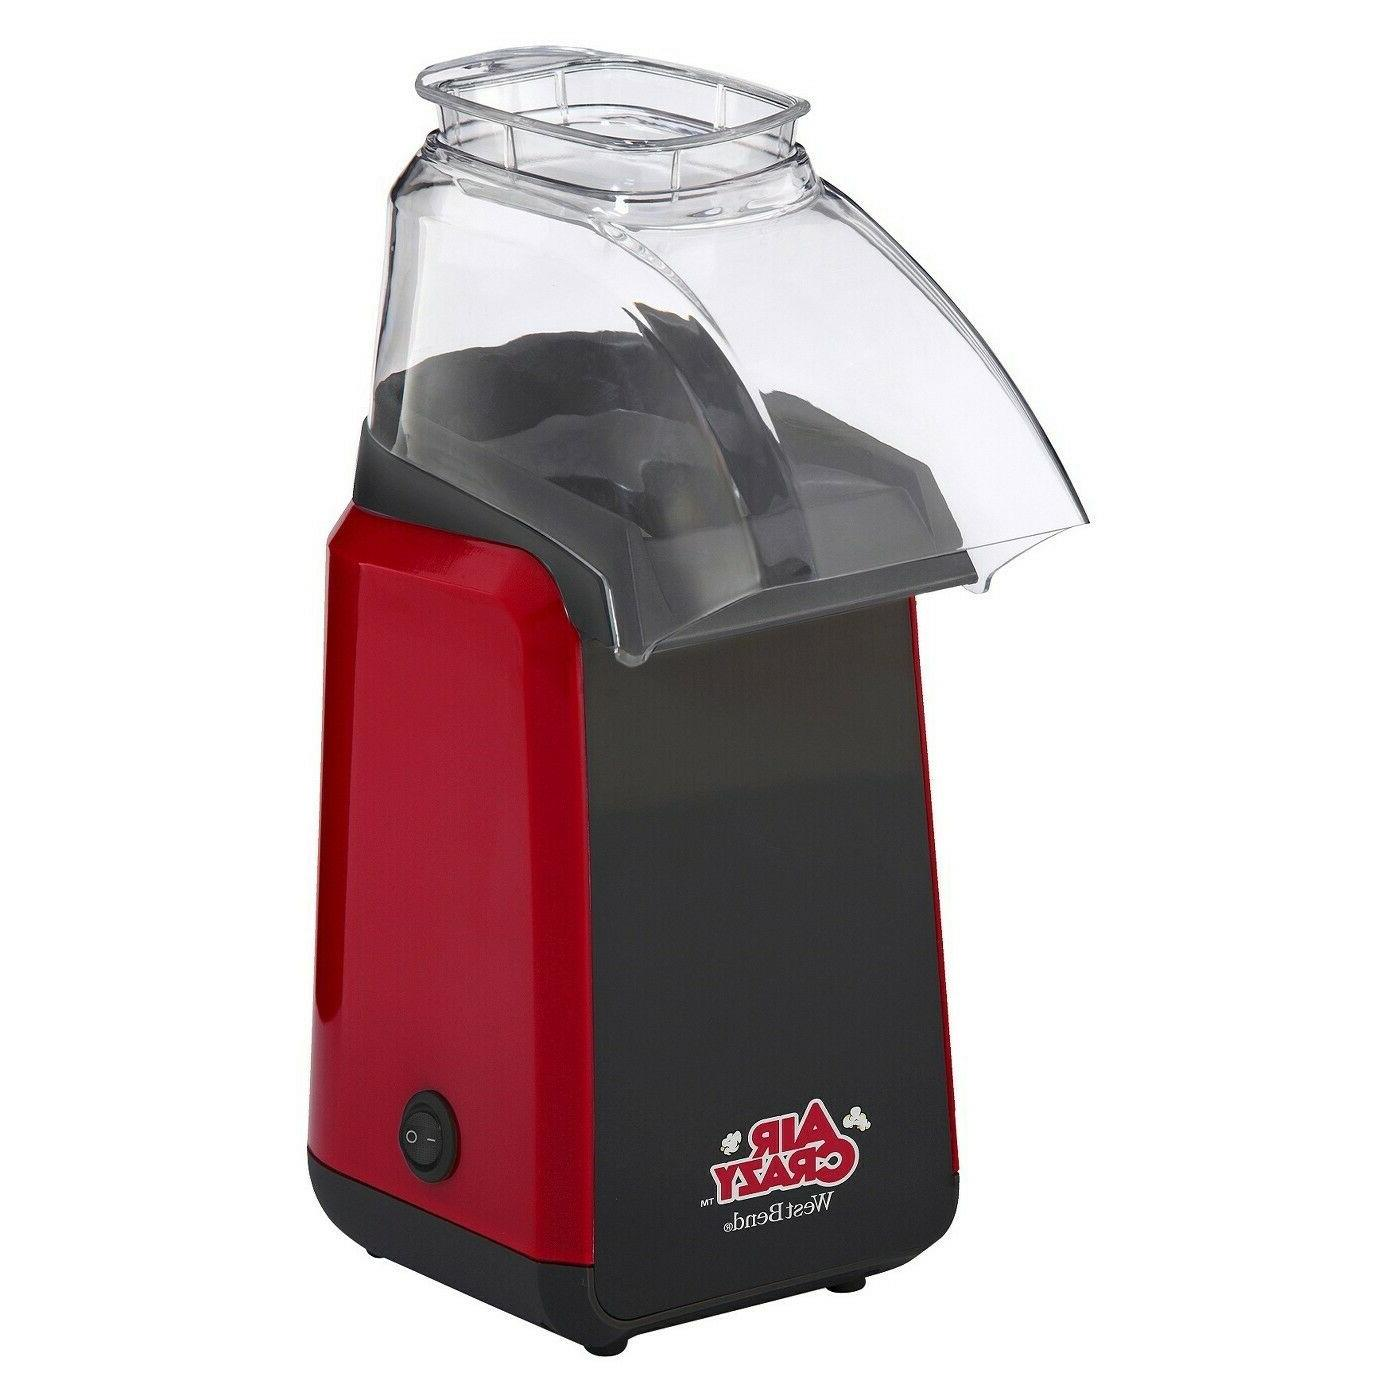 82418r air crazy hot air popcorn popper